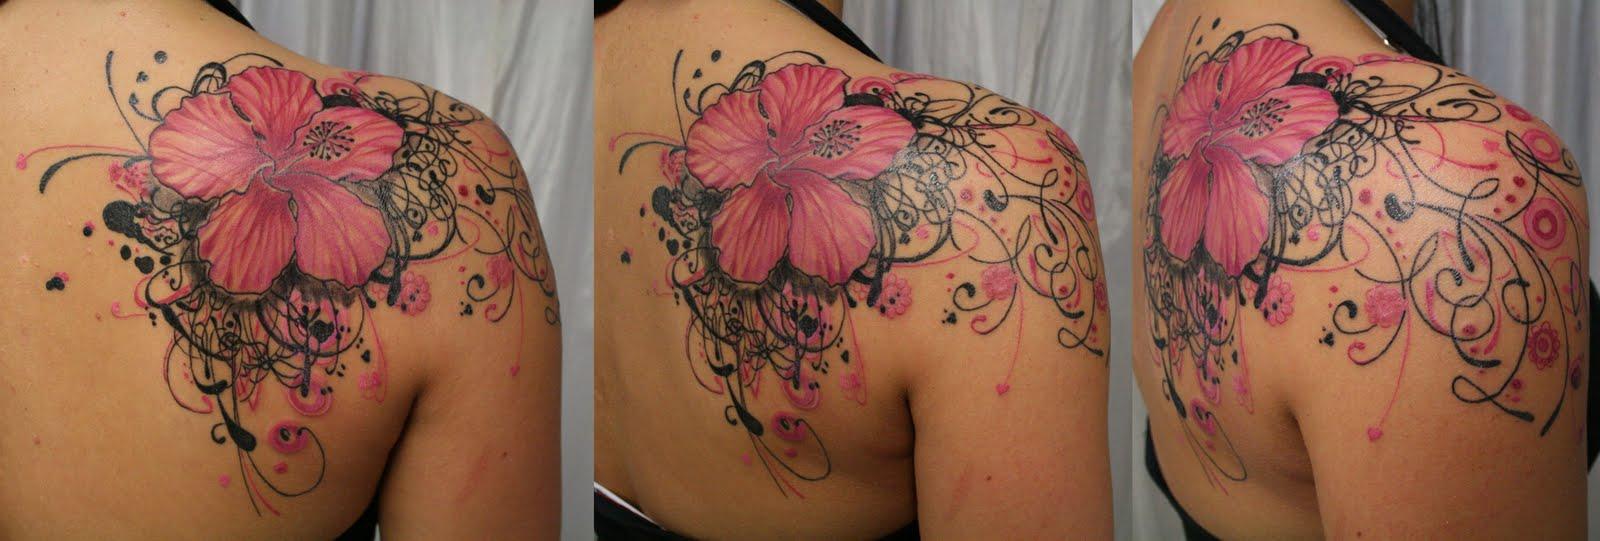 Pink flower heart tribal tattoo tattoo art gallery for Pink heart tattoo